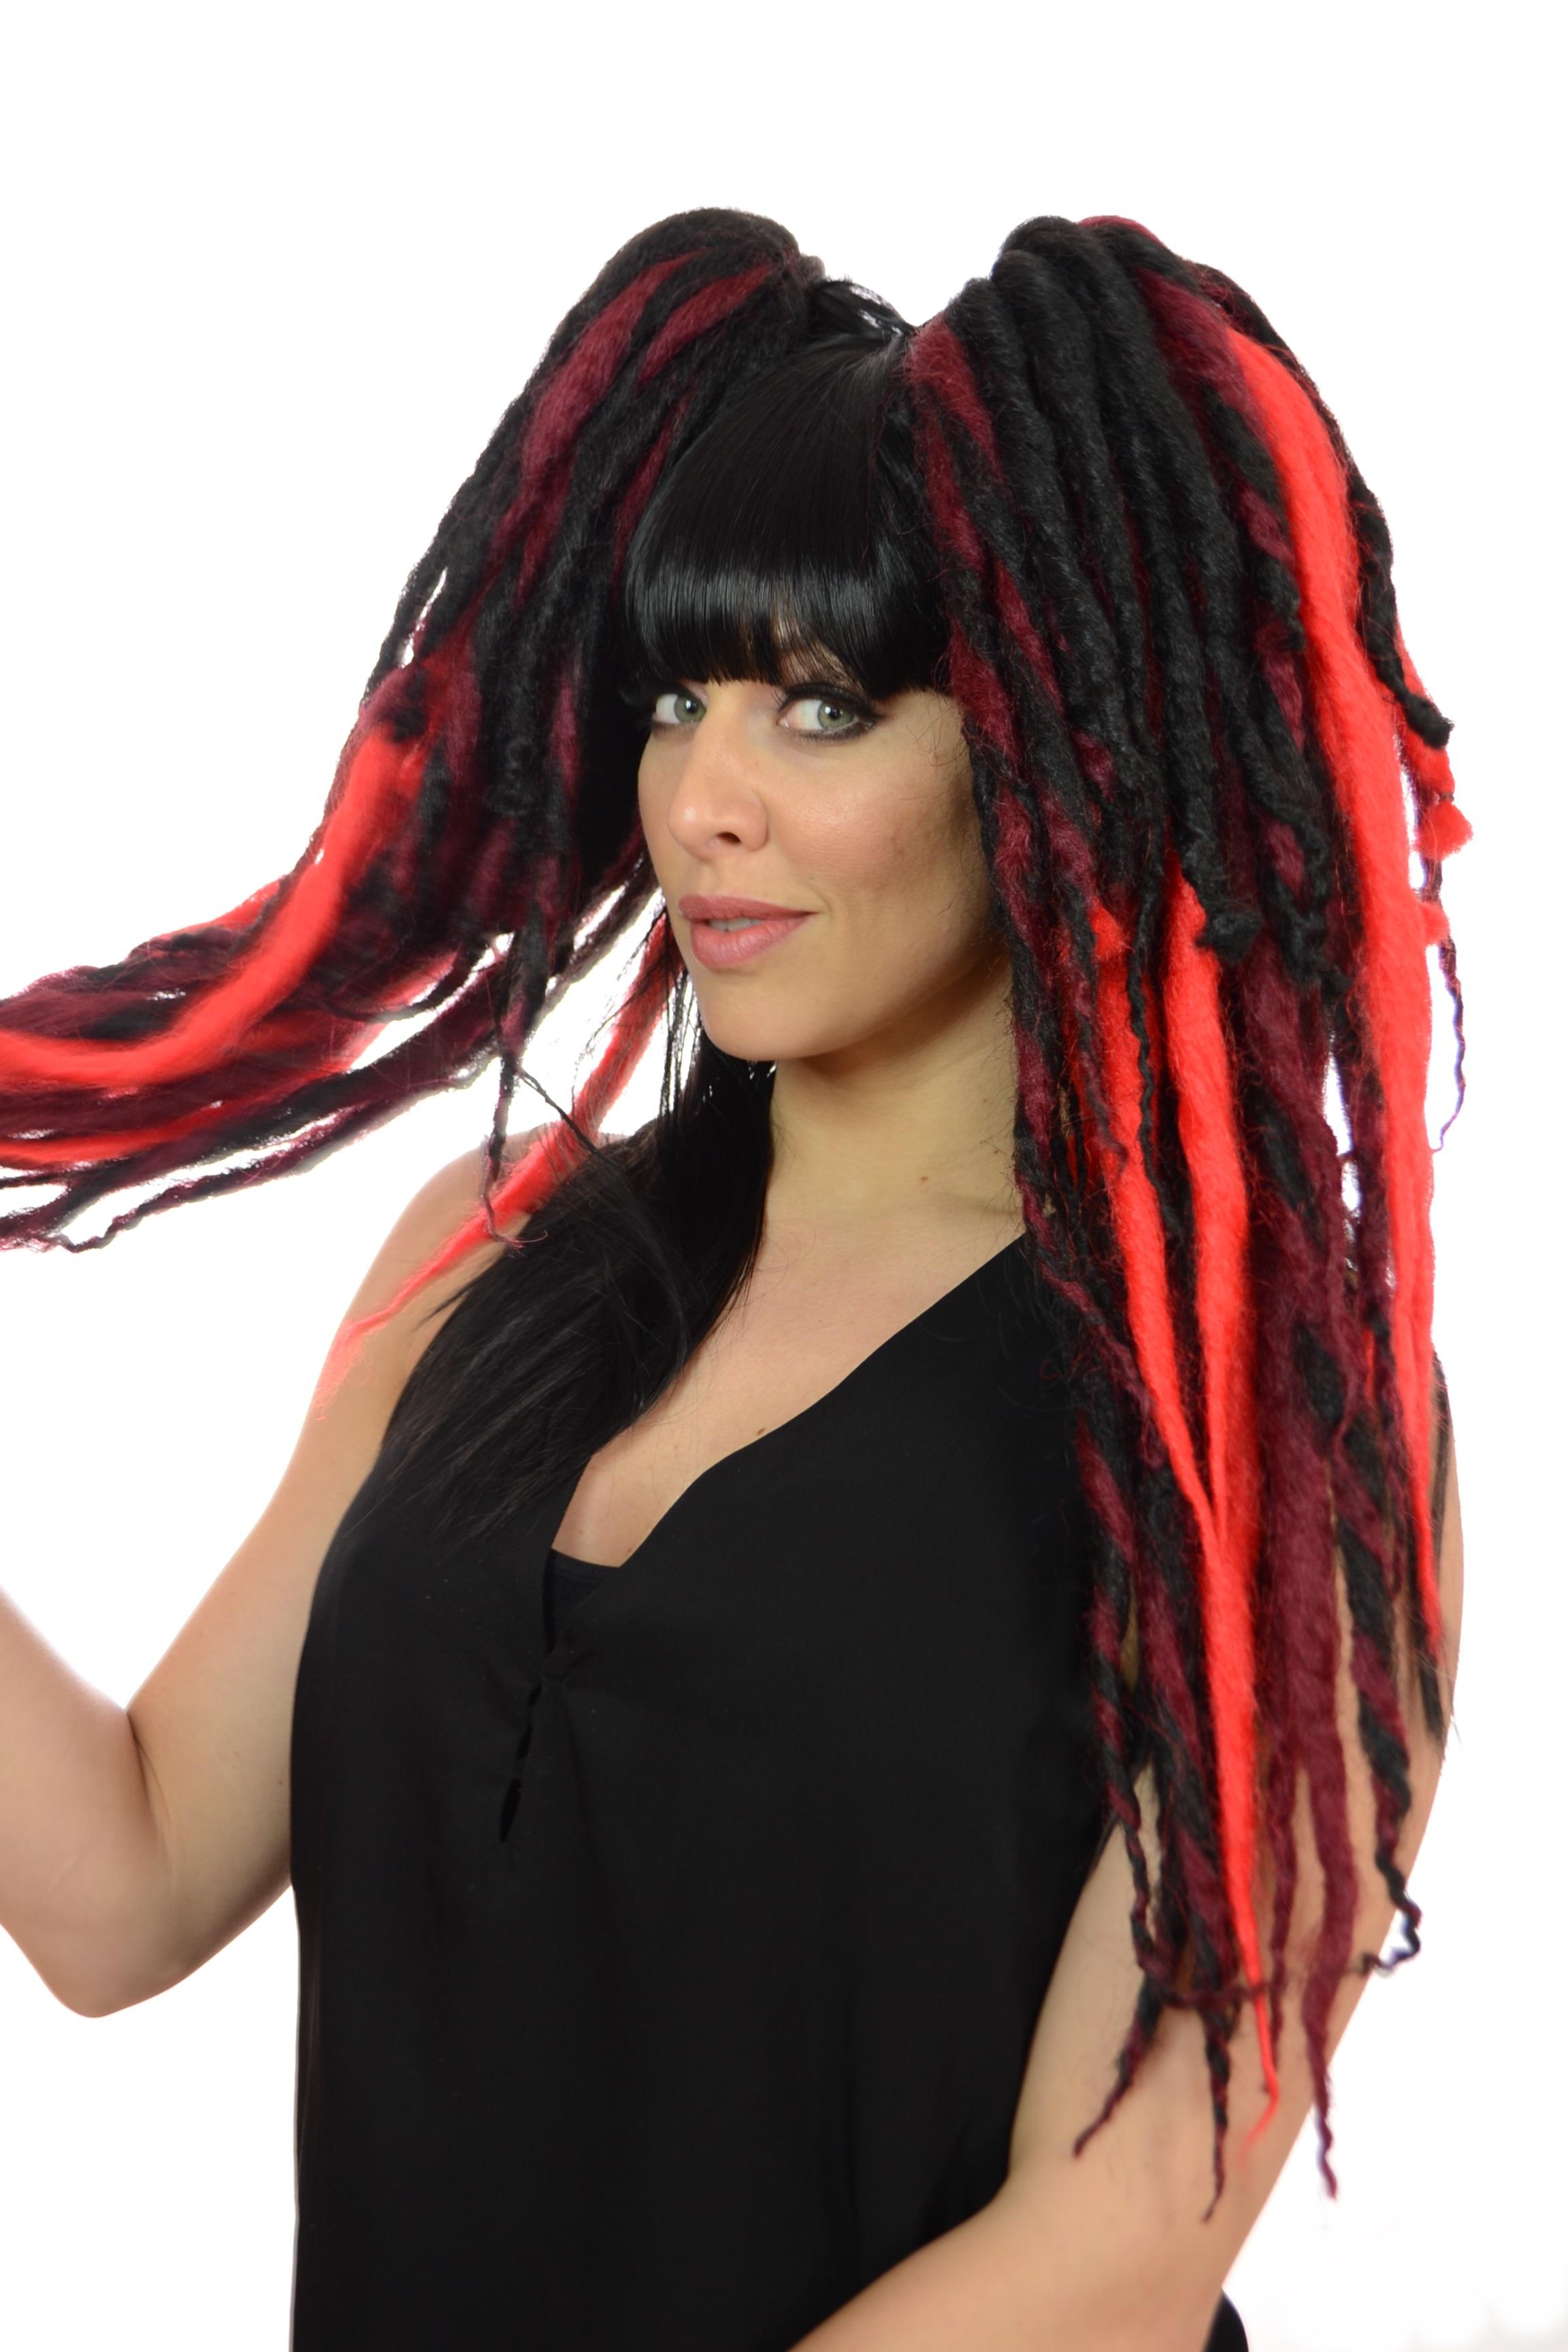 Lottie Long Dreadlock Ponytail Wig 3 Bright Shades